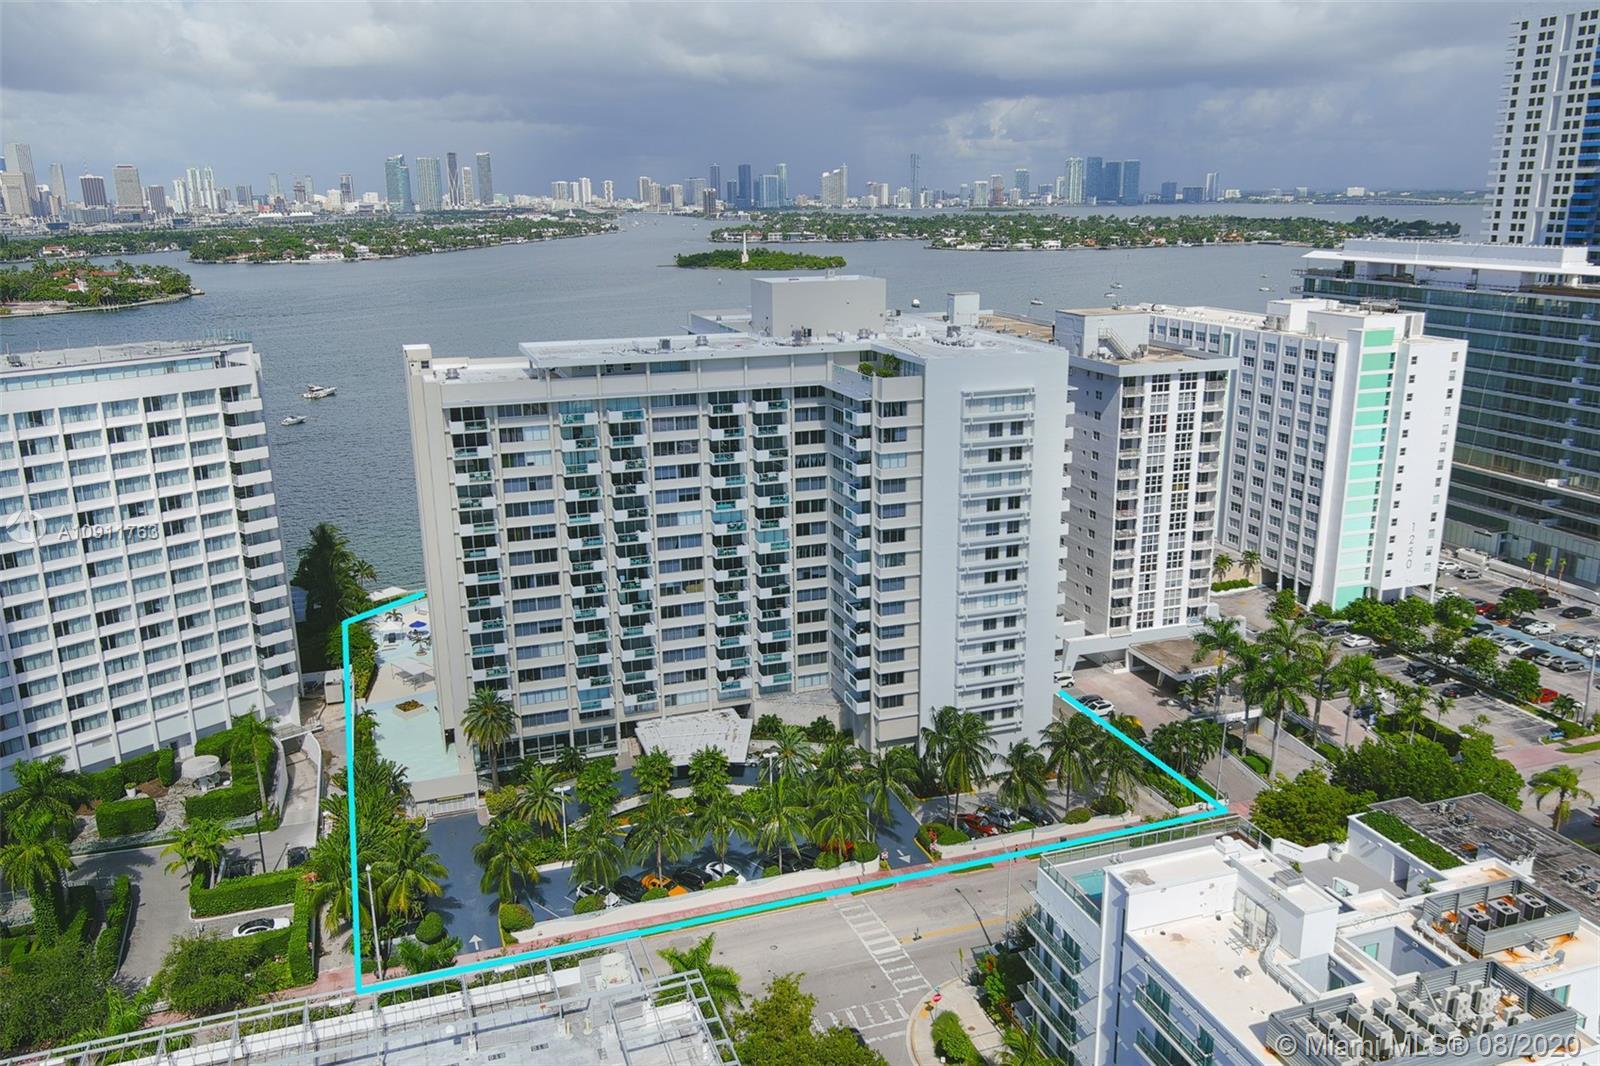 Mirador North #808 - 1200 West Ave #808, Miami Beach, FL 33139